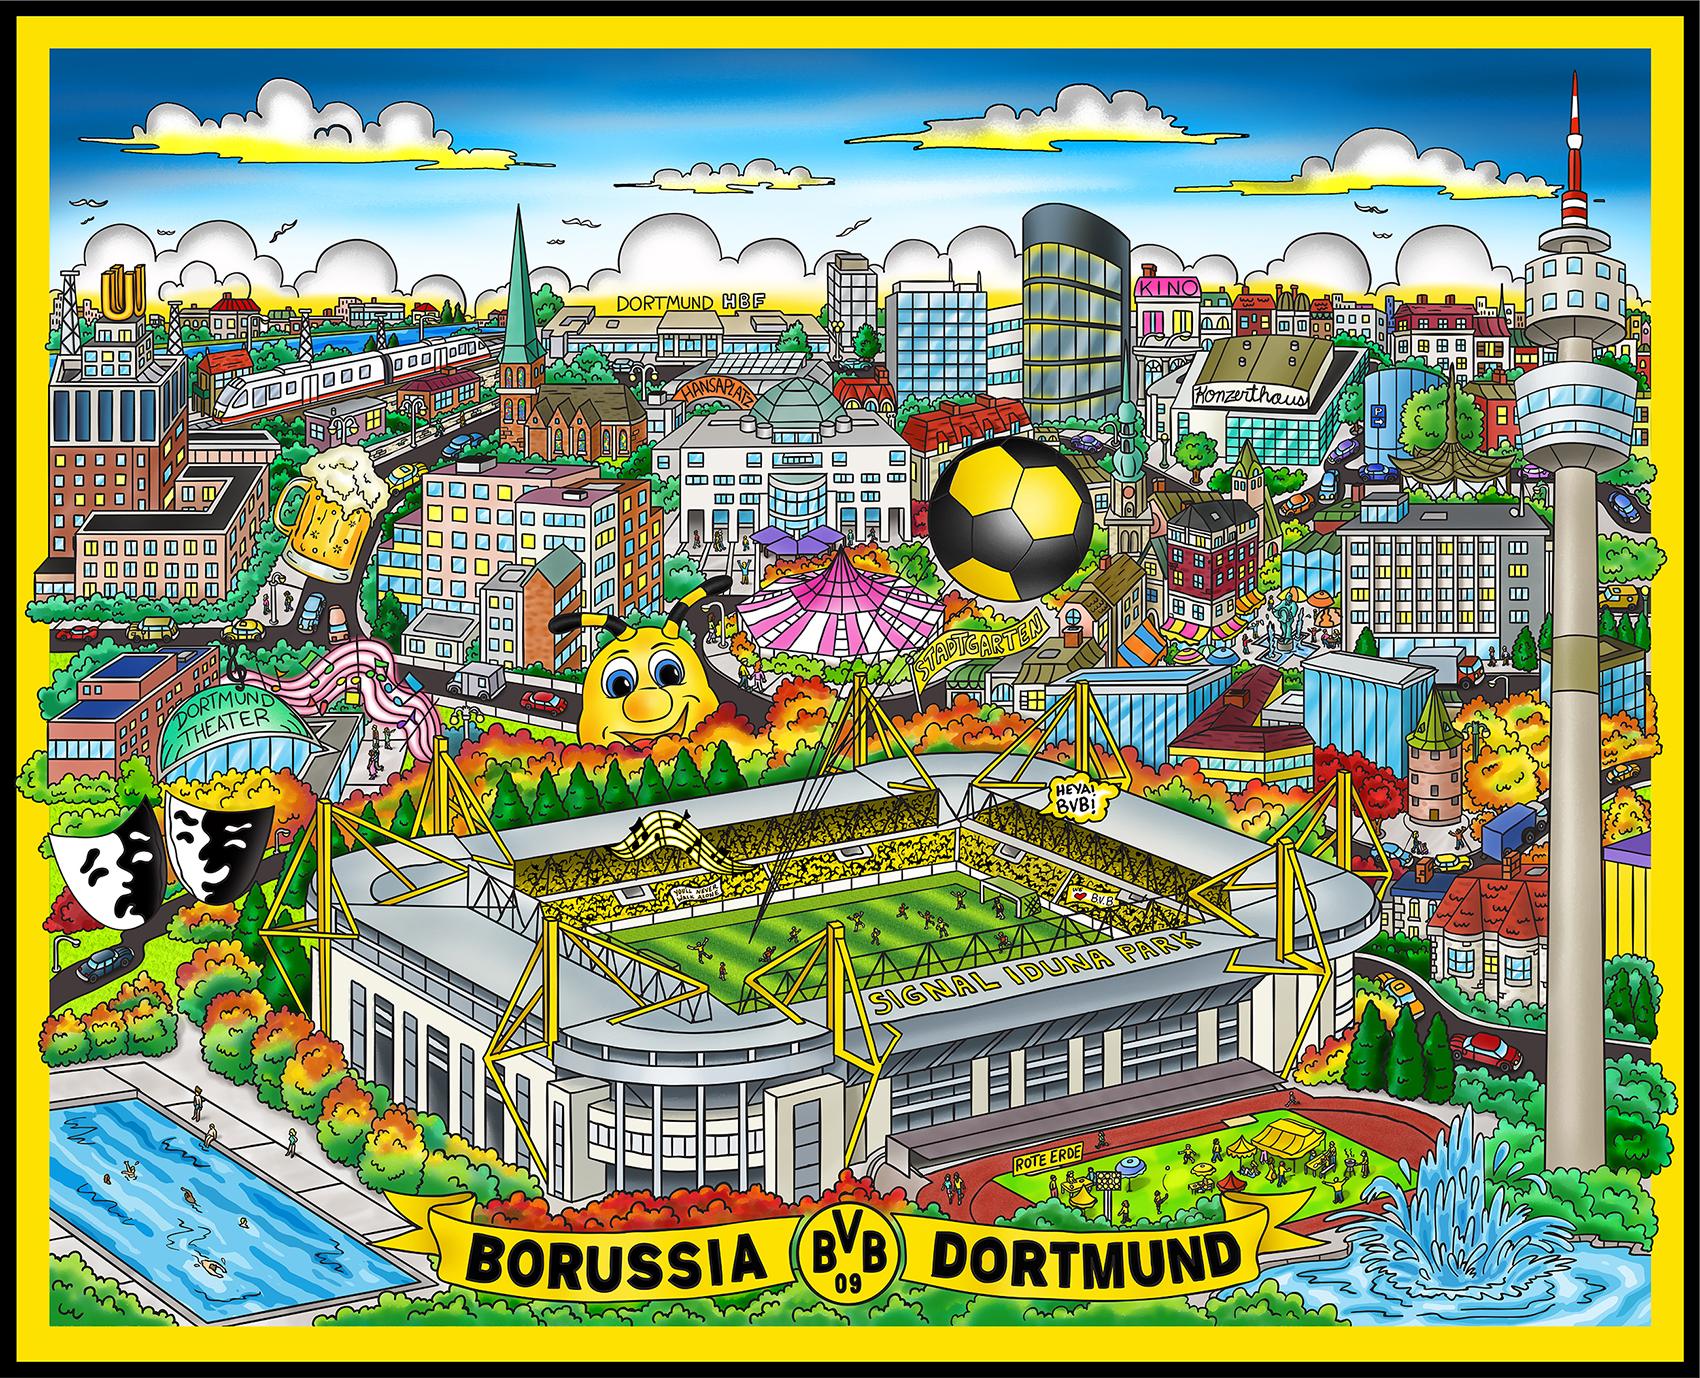 Charles Fazzino - Borussia Dortmund  , 5553-008-002-023-033-034